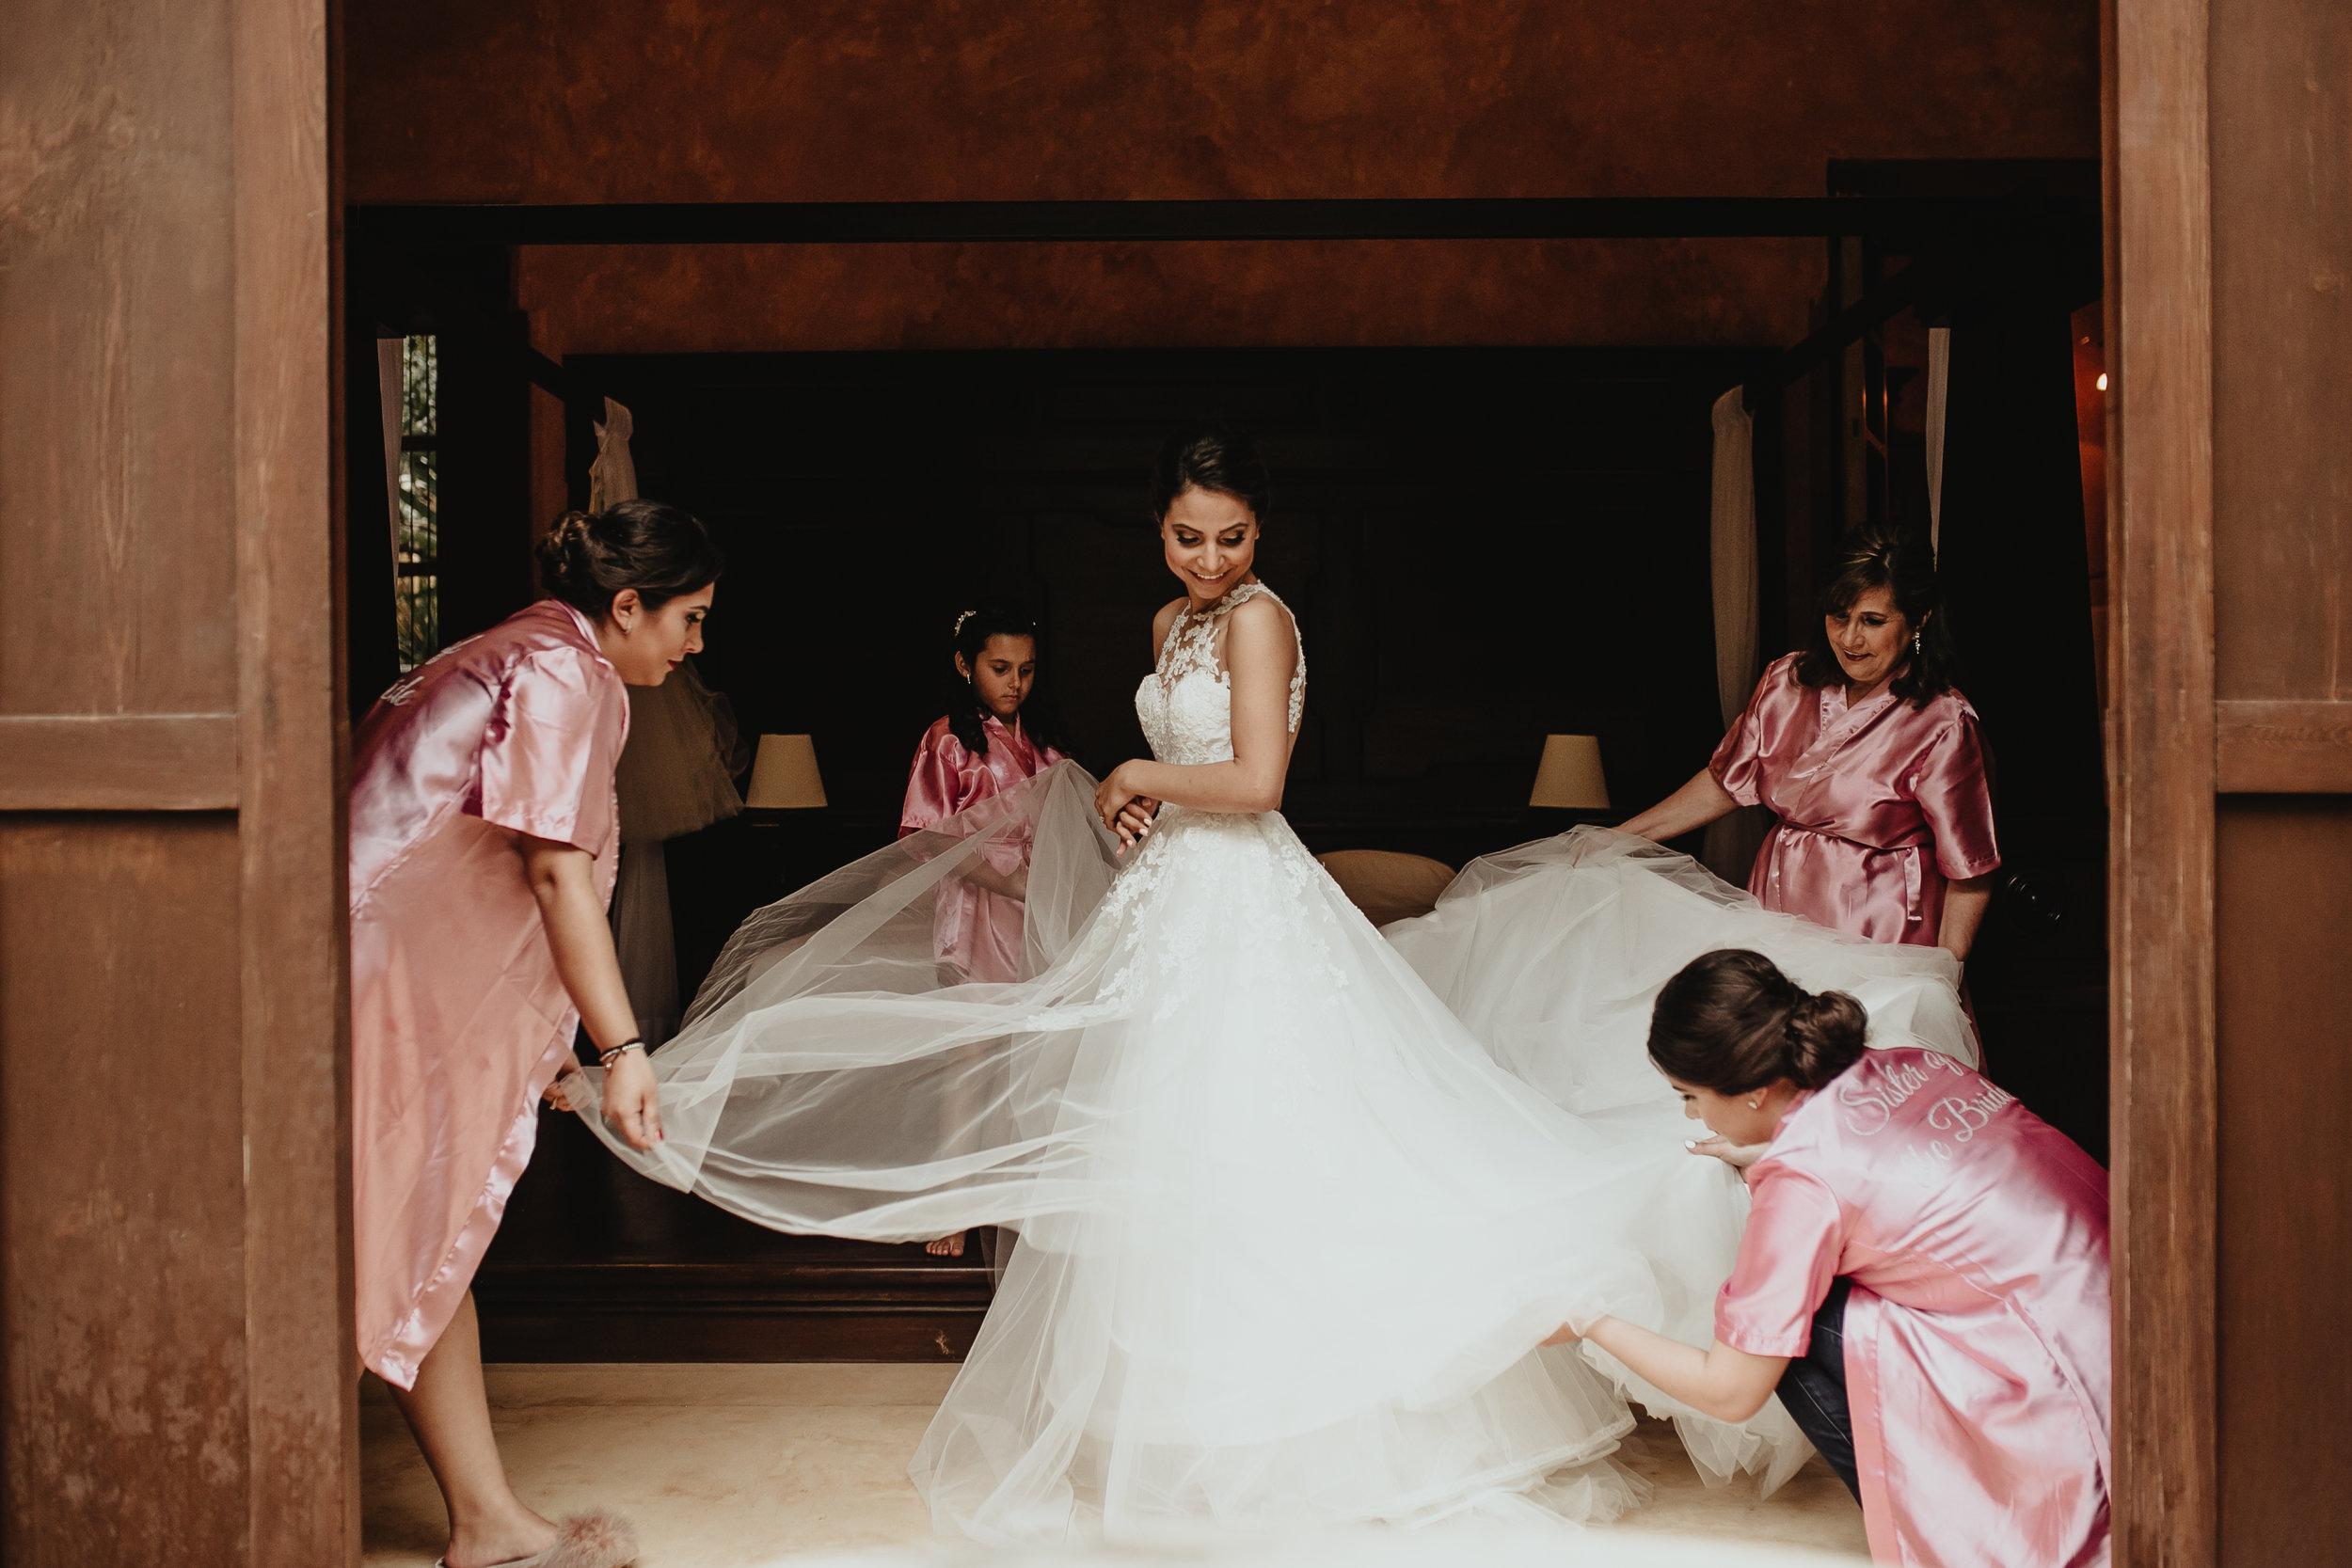 0070K&Aslide__HaciendaTekikDeRegil_Wedding_WeddingDstination_MeridaYucatan_HaciendasMerida_BodasMexico_BodasYucatan_Boda_Destino.jpg